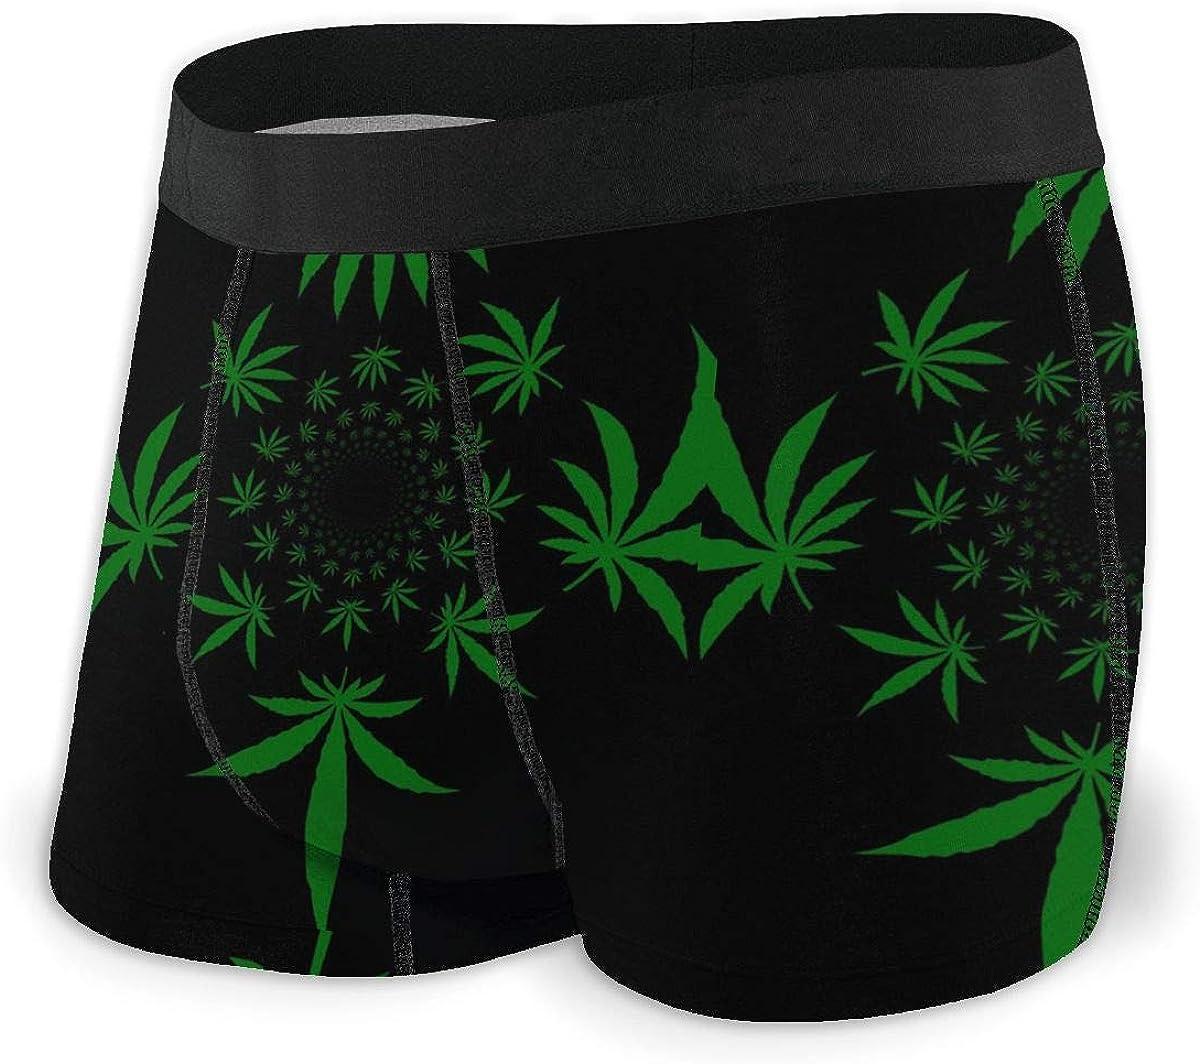 Heart Mens Boxer Briefs Underwear for Men S-XXL Polyester Spandex Quick Dry